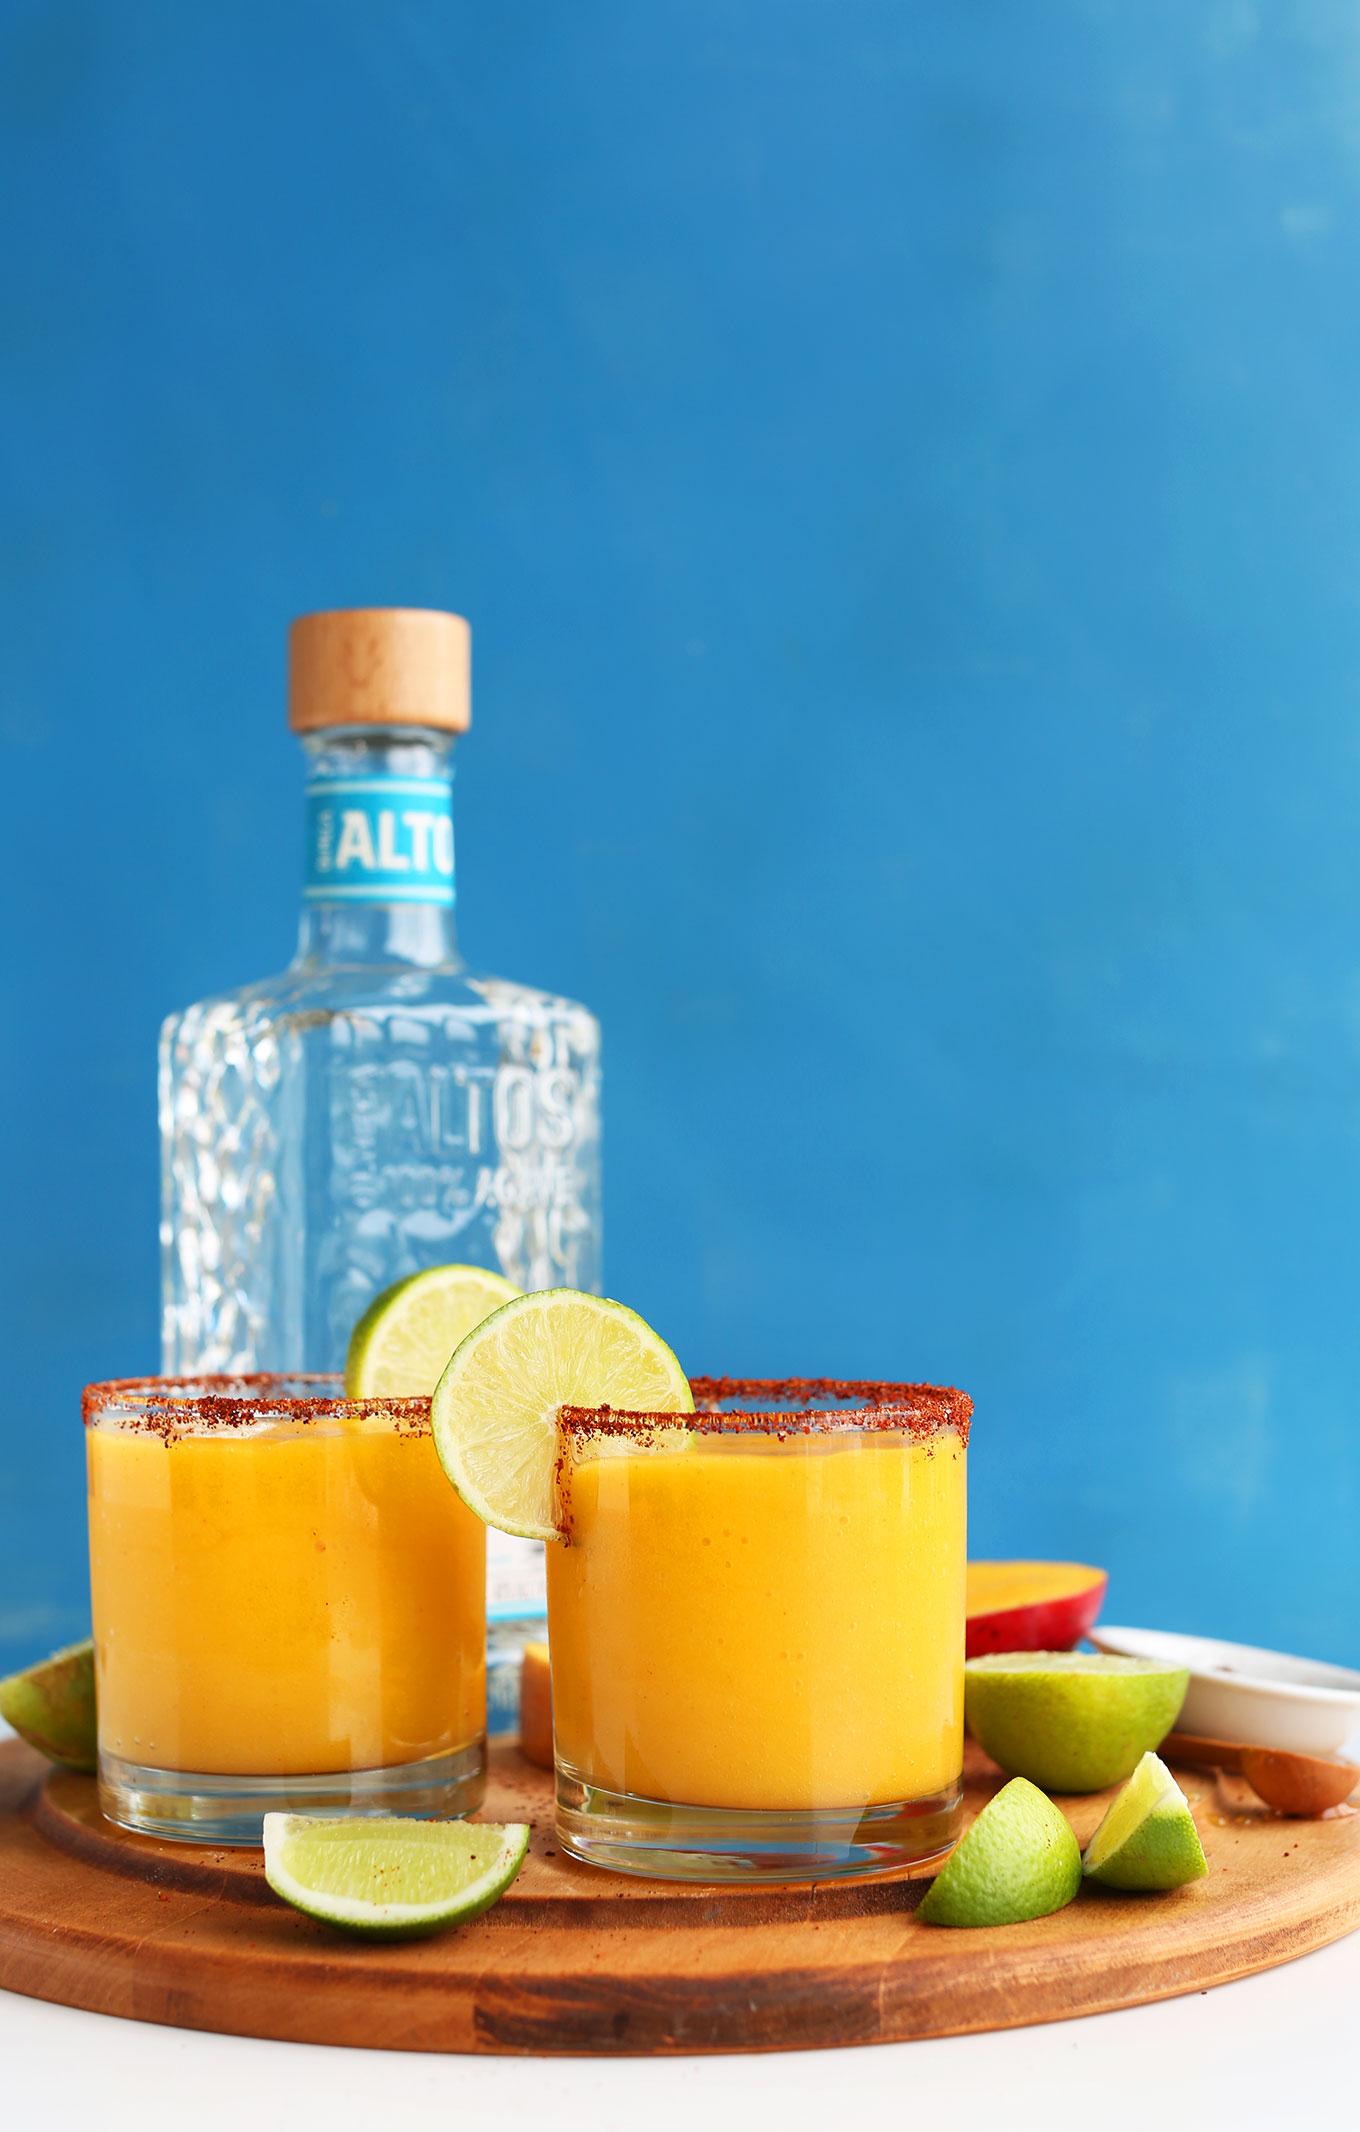 Sweet + Spicy Mango Chili Lime Margs // via Minimalist Baker